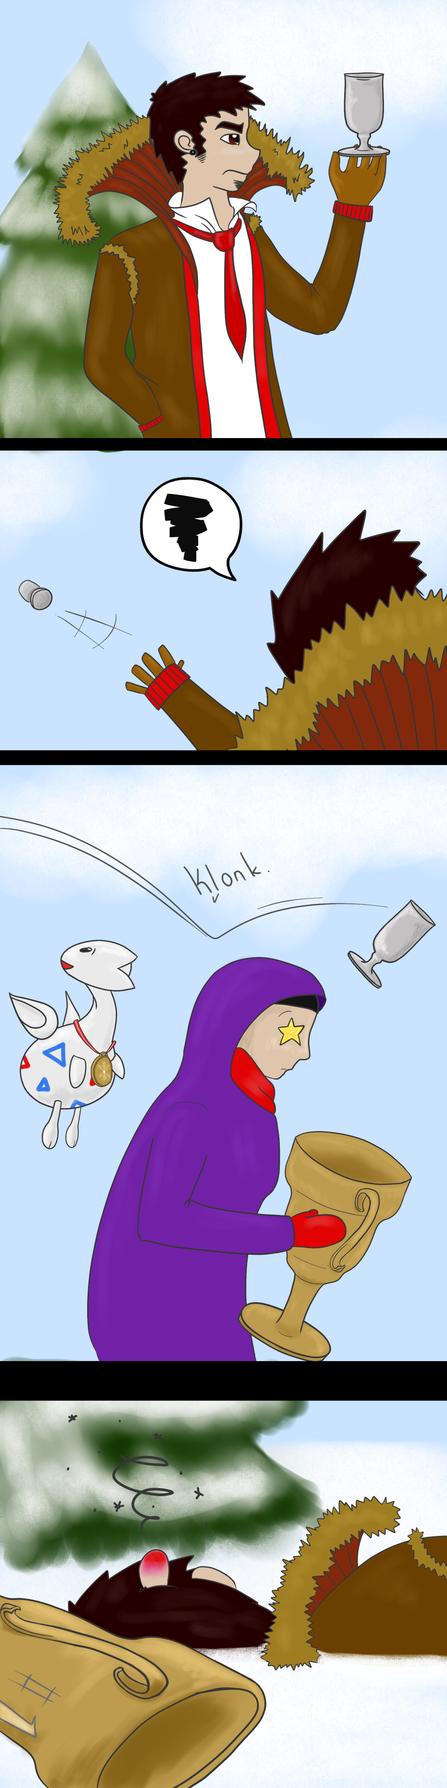 Snowball Wars: Aftermath. by sandraman